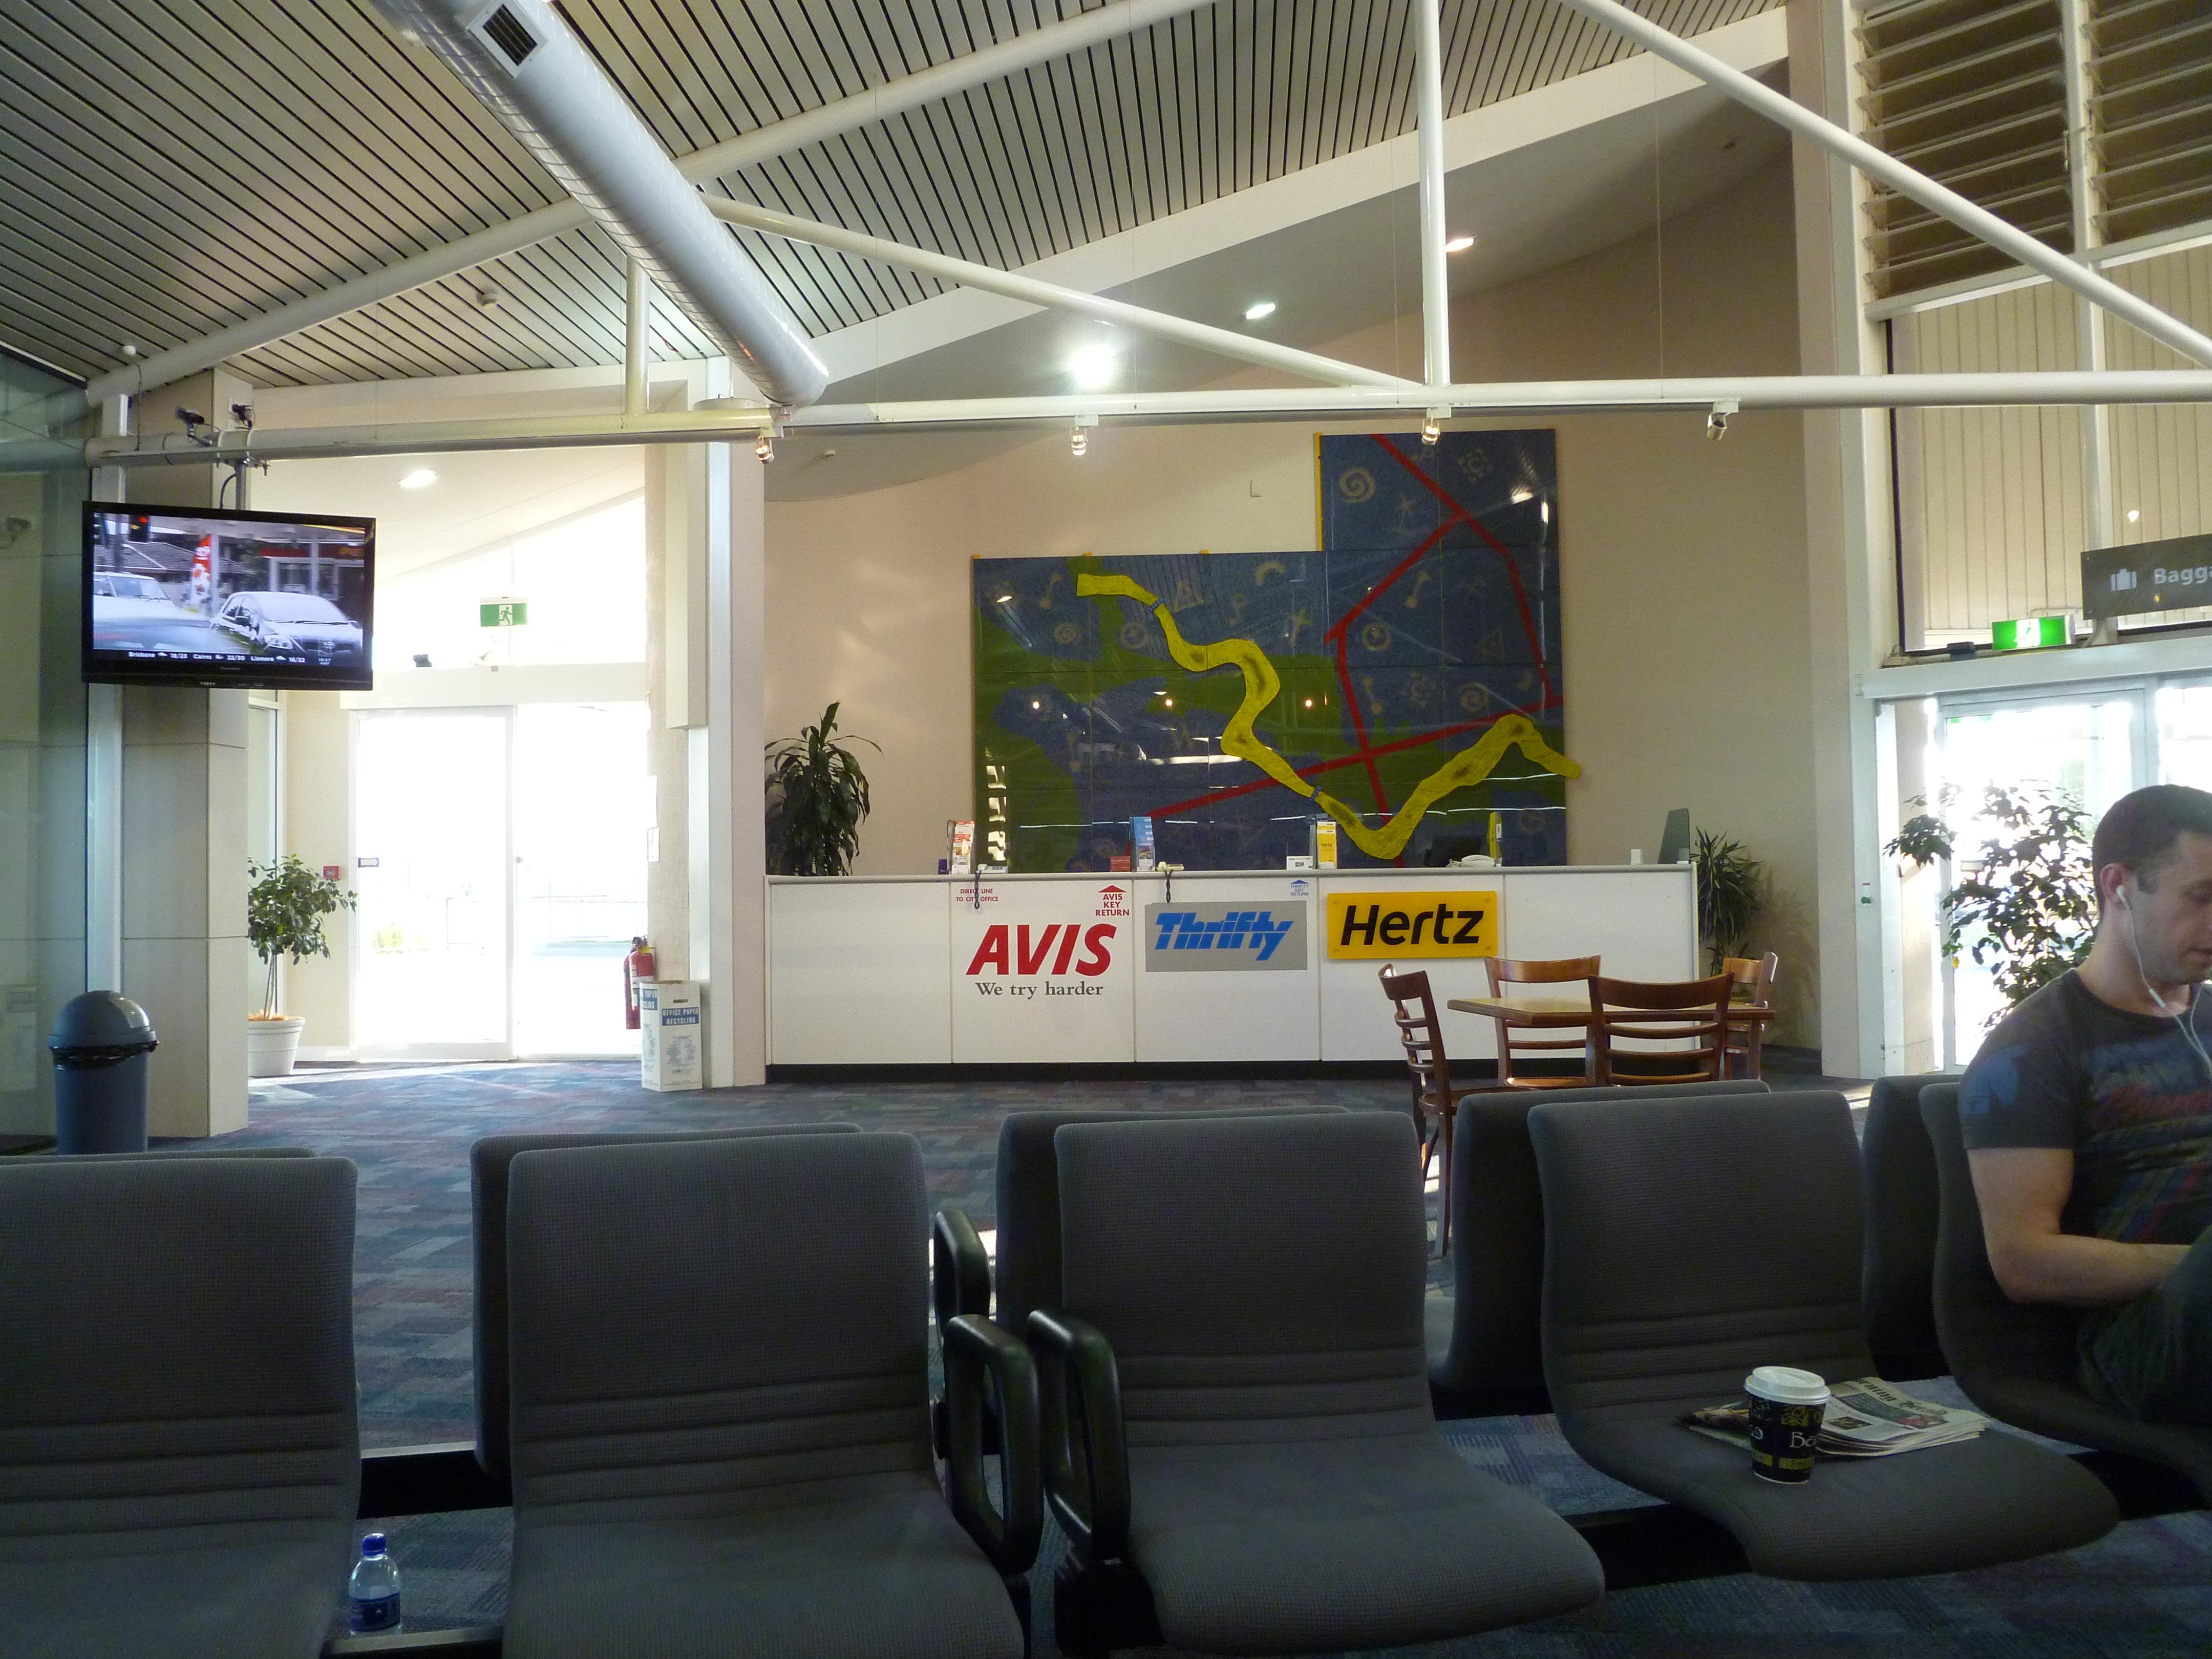 Car Desks Filecar Rental Desks At Wagga Wagga Airportjpg Wikimedia Commons